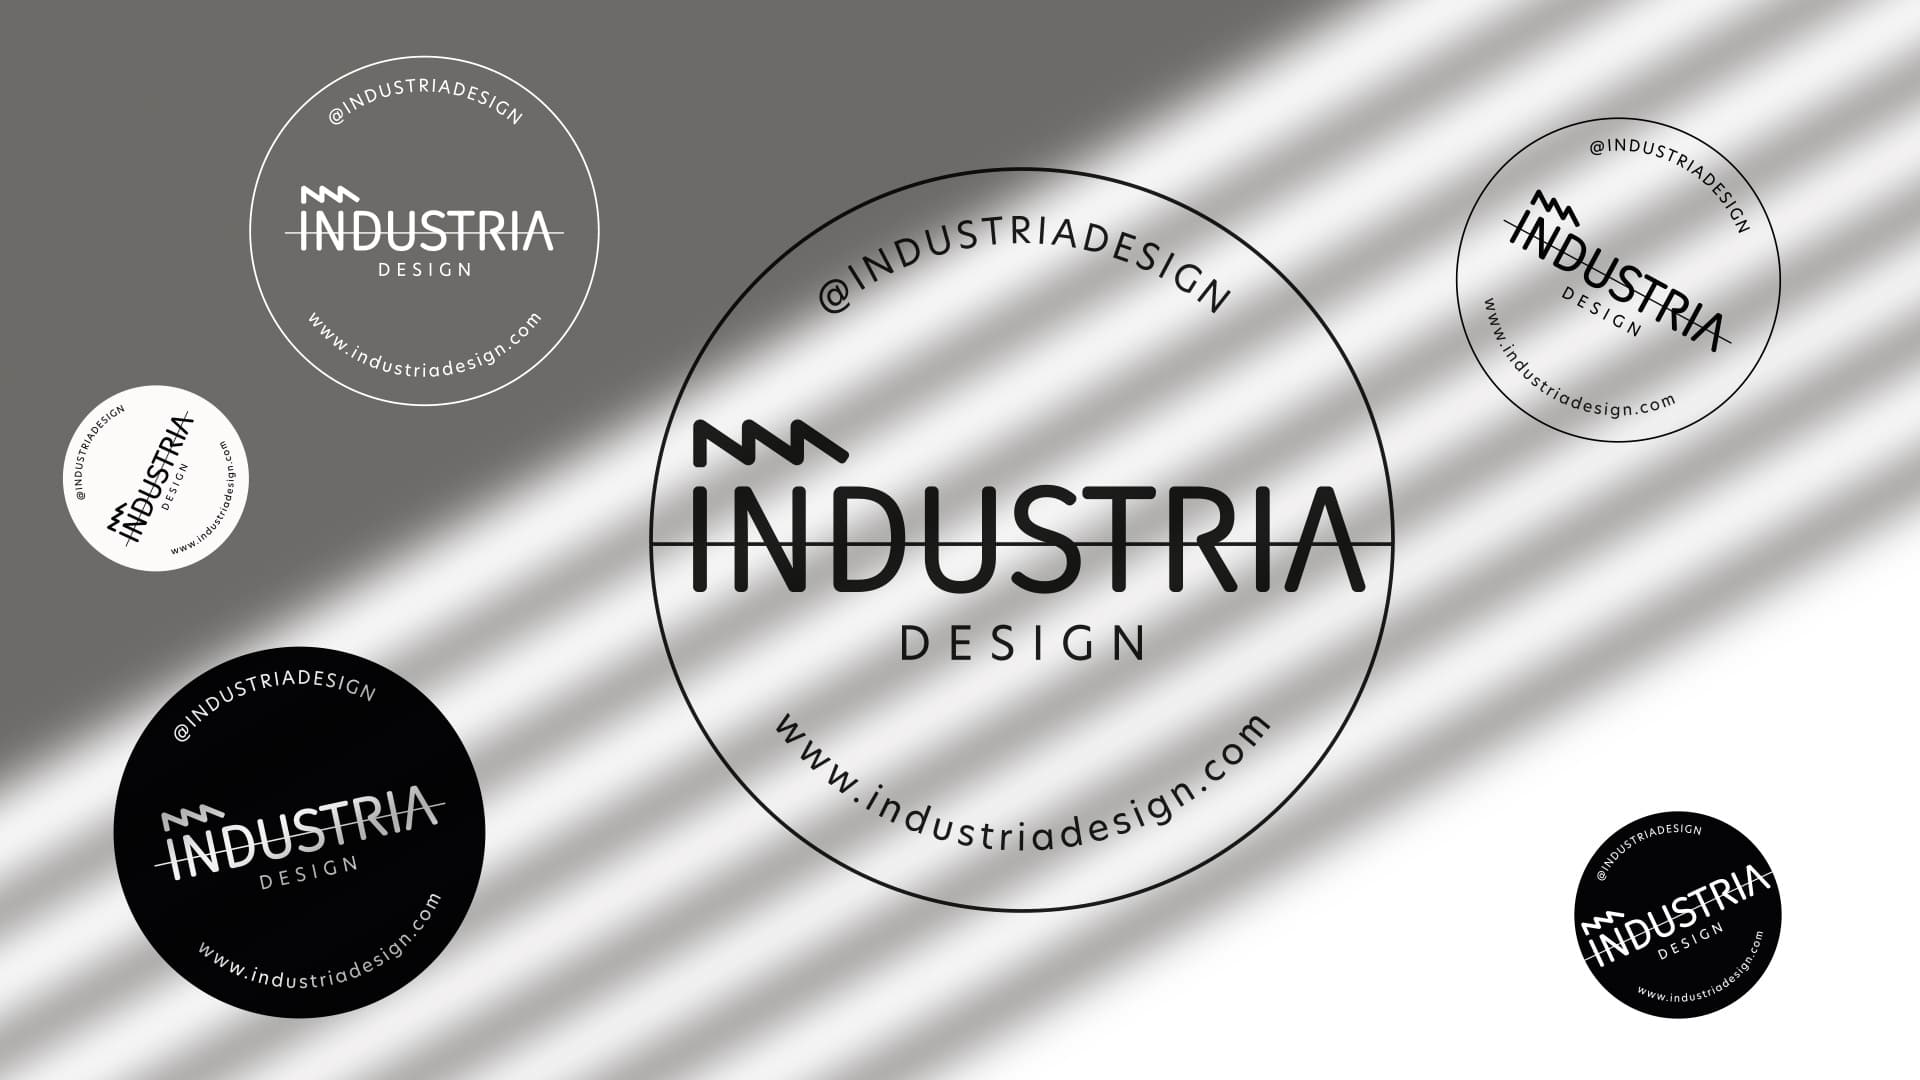 industria design logo stikers